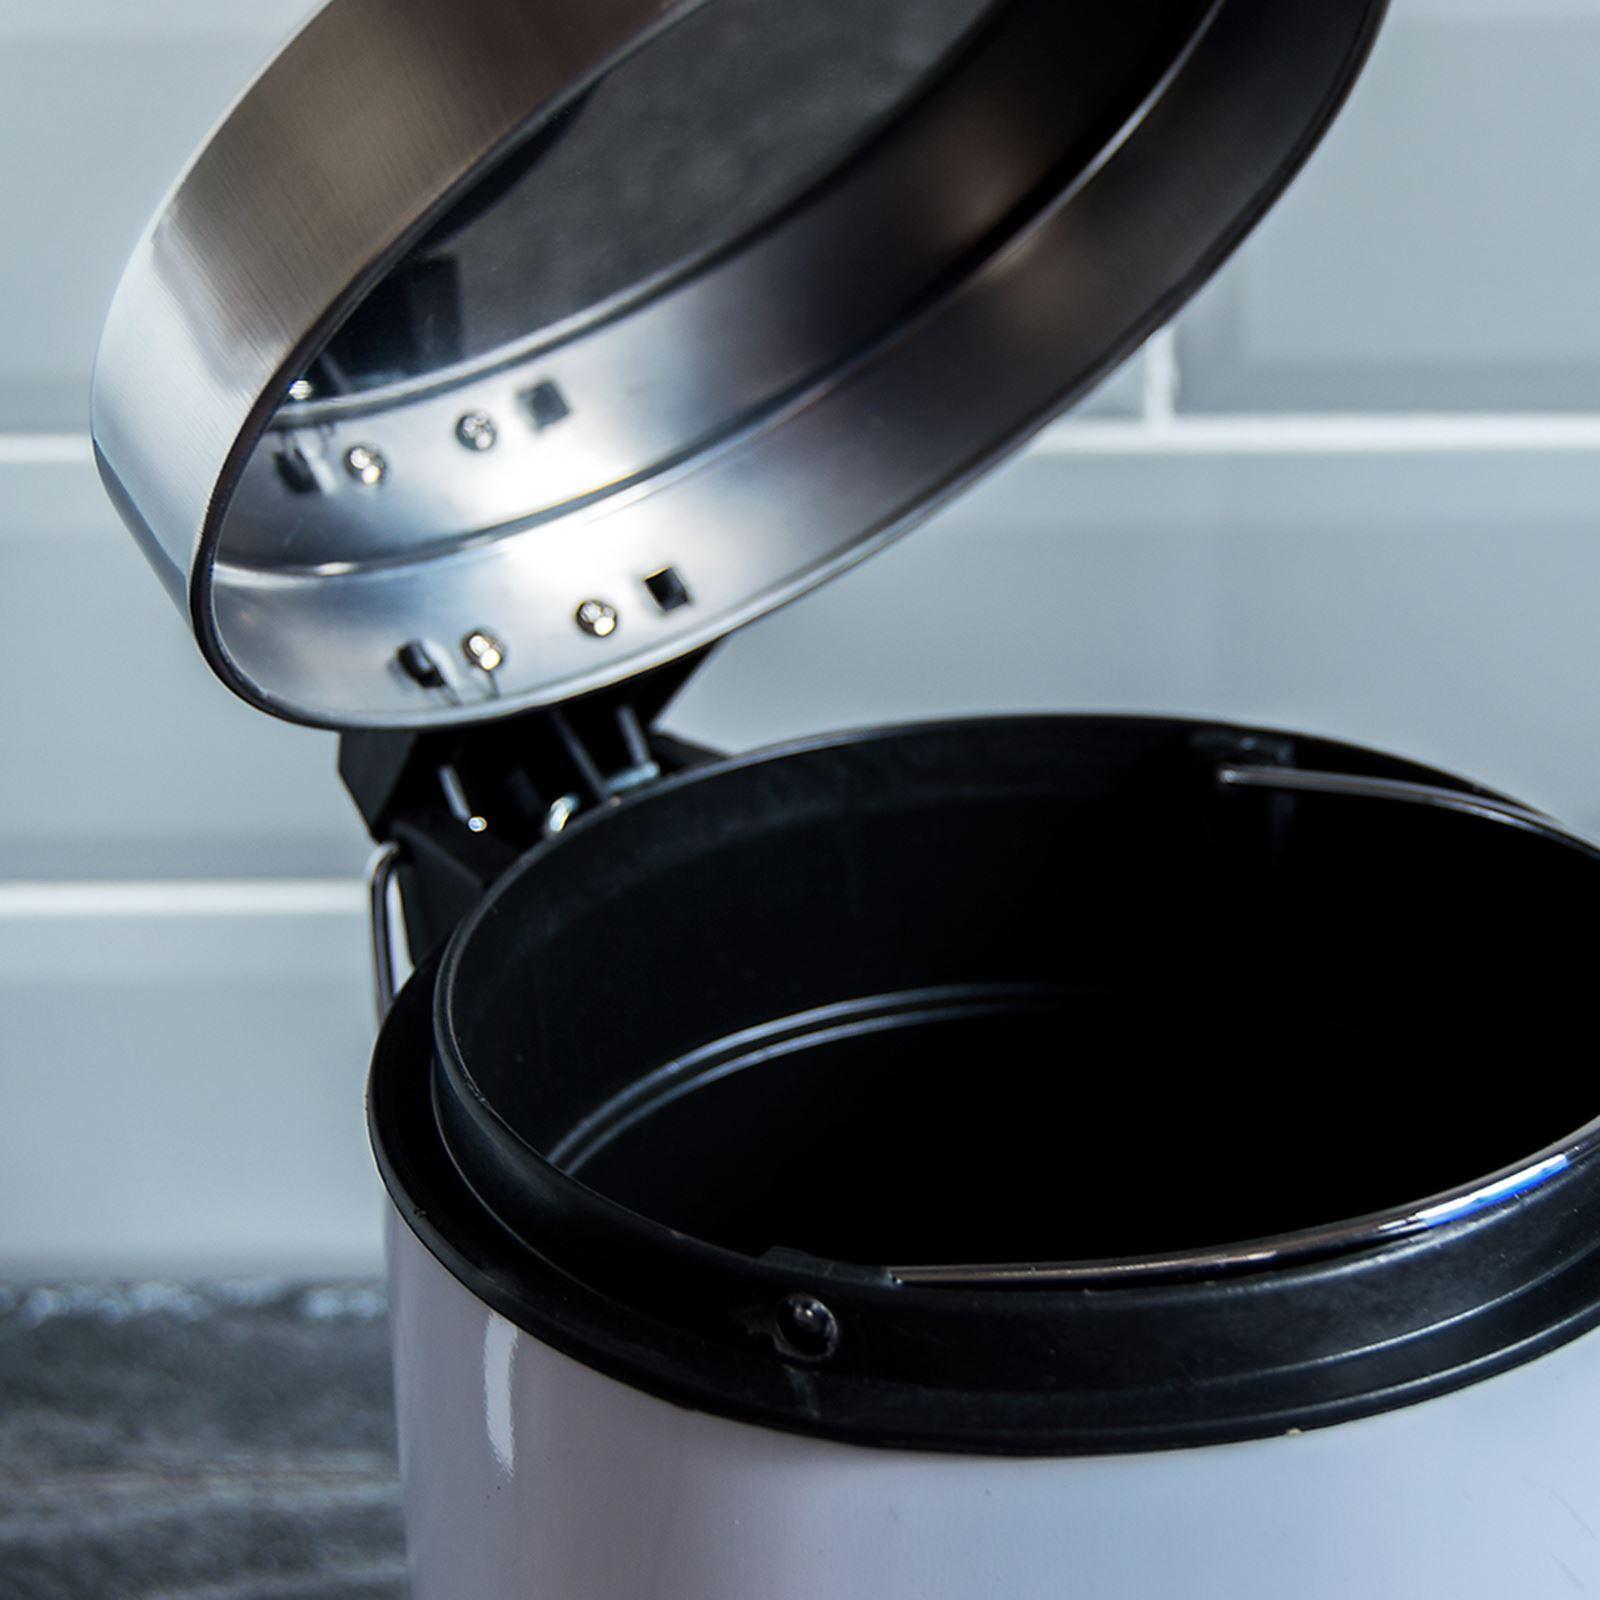 Pedal Bin 3L or 30L Bathroom Waste Kitchen Rubbish Black White ...